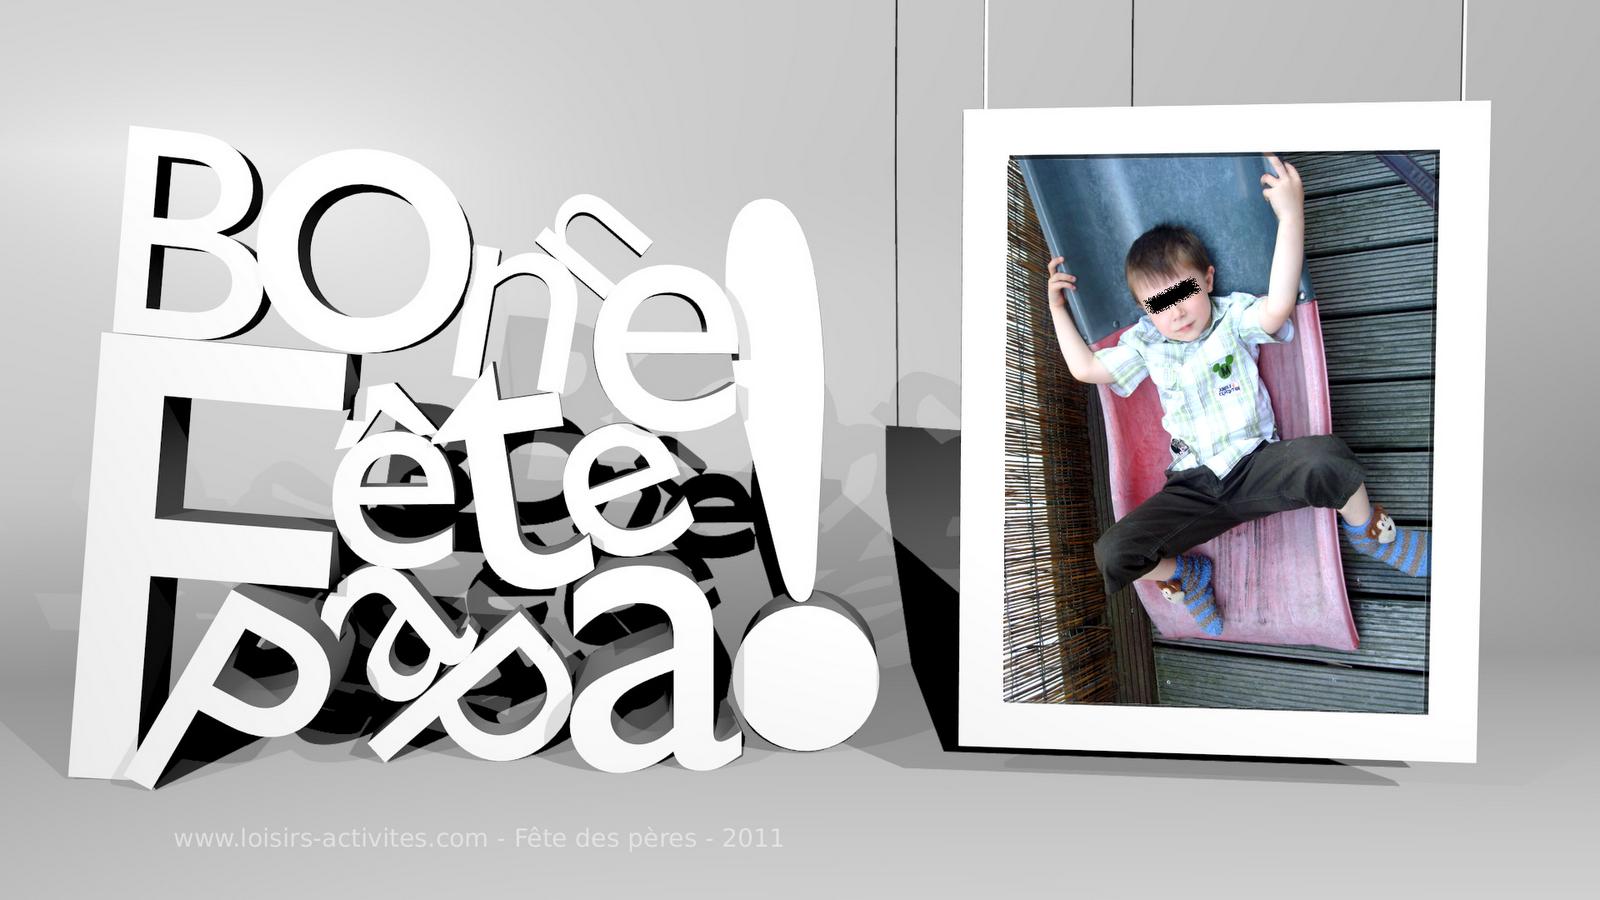 http://3.bp.blogspot.com/-Zl7RUtC9mCg/Tfr0LrNCydI/AAAAAAAAAKQ/jjJ9F3NPJcc/s1600/ecarte-carte-fete-des-peres-wallpaper-fonds-d-ecran-exemple1.png